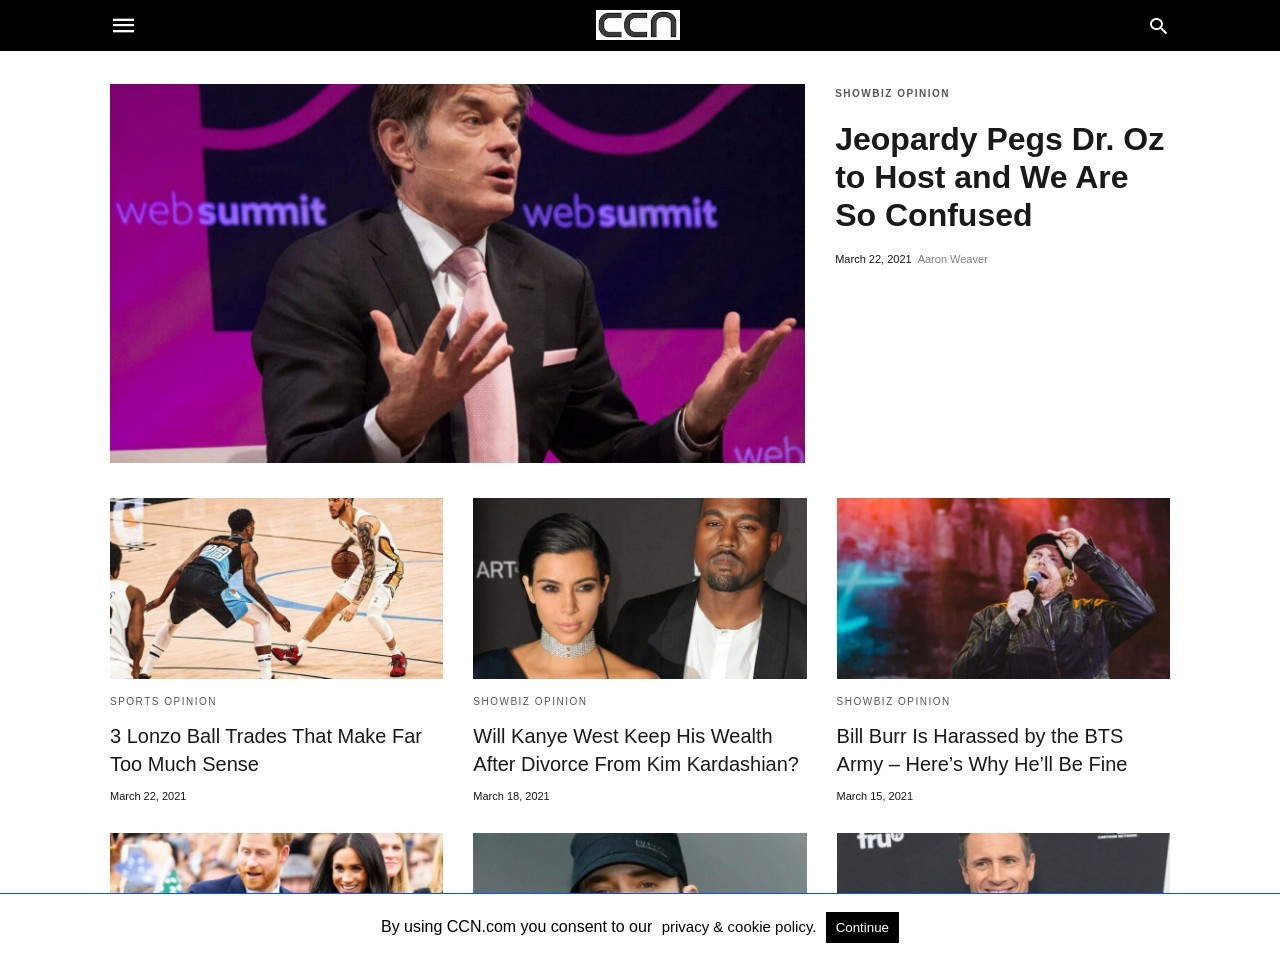 ccn.com